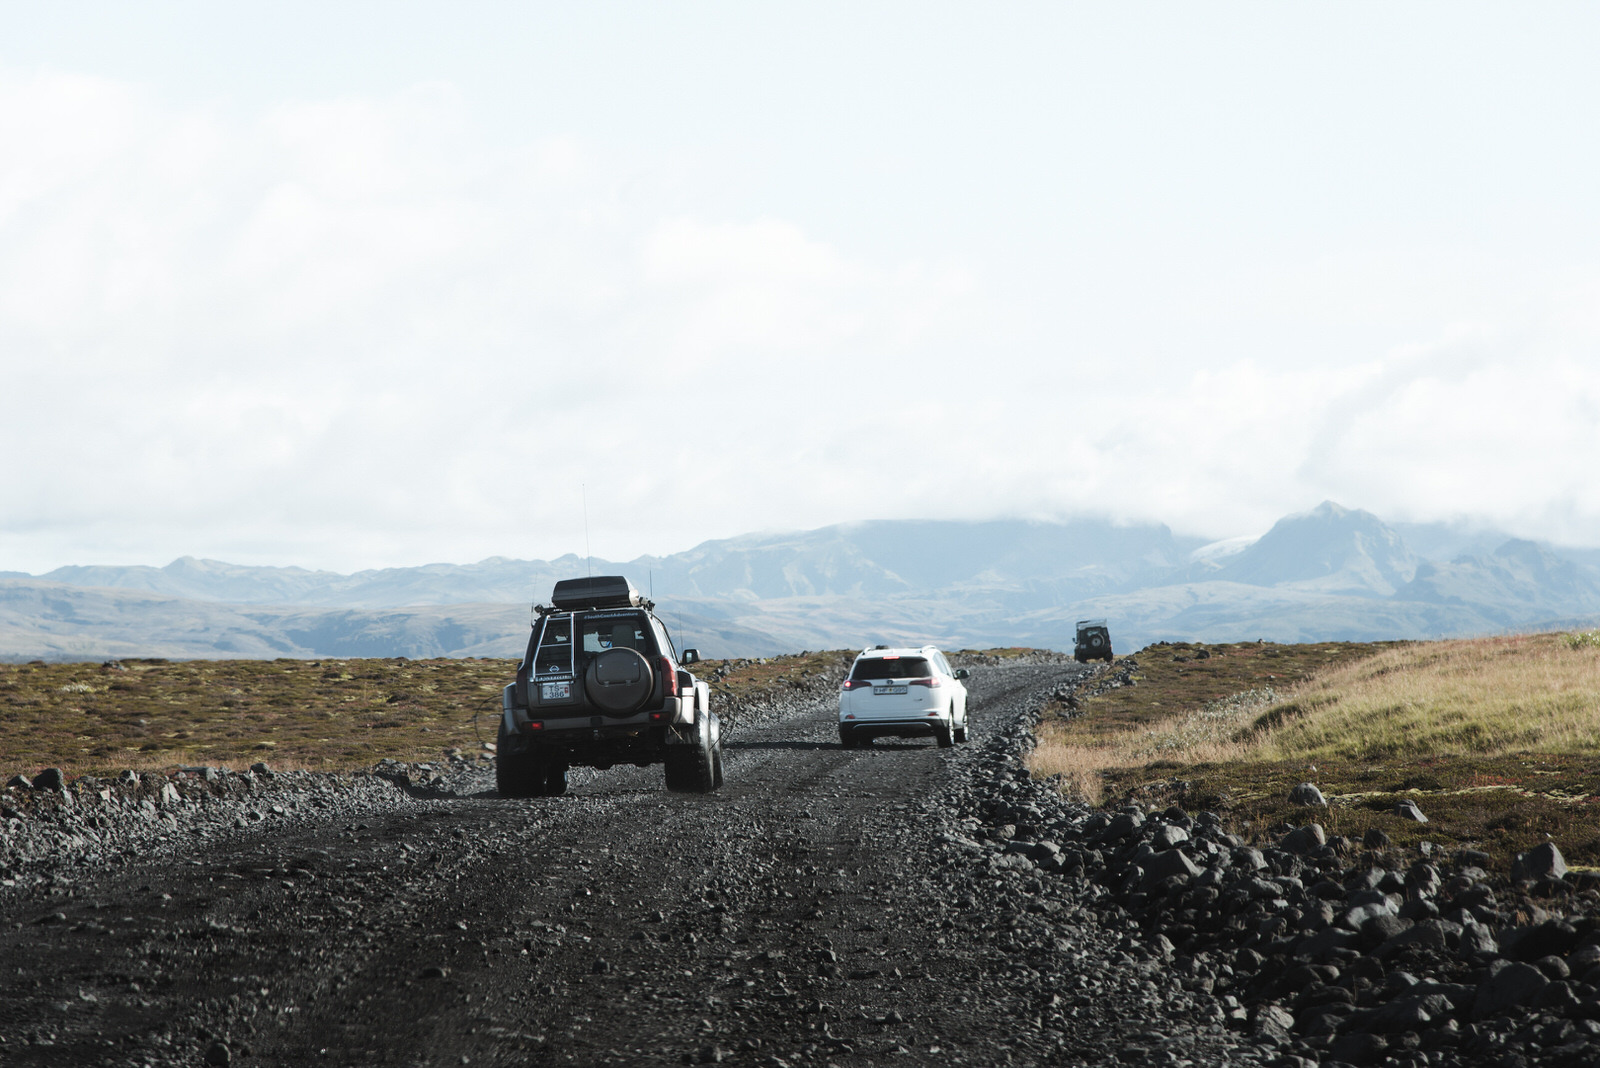 iceland road trip day 4 - thorsmork valhanukur seljalandsfoss